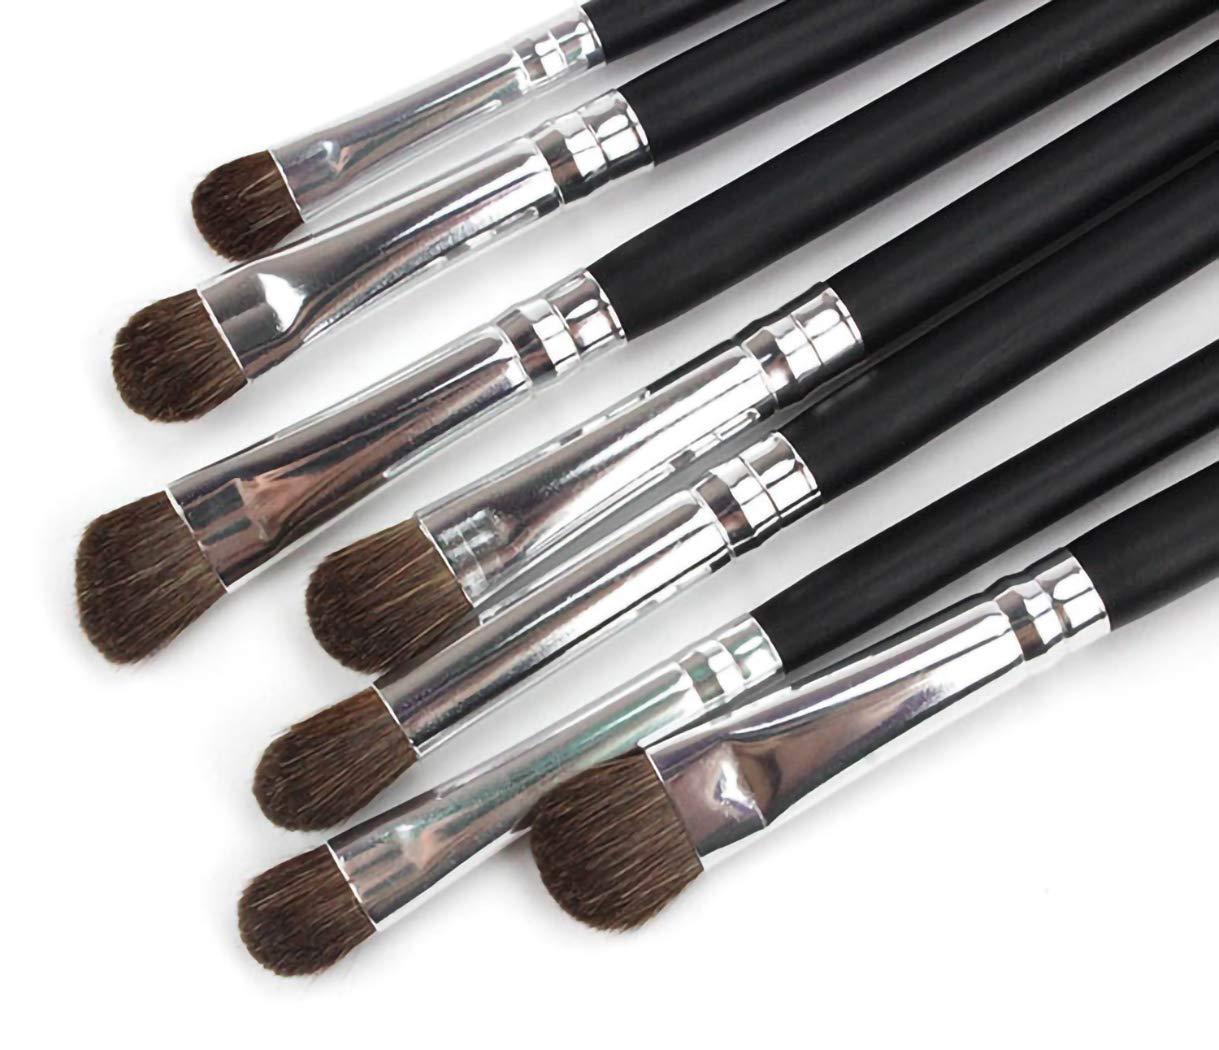 MISUD Eye Makeup Brush Set 7 Pcs Eyeshadow Makeup Brushes with Carrying Bag, Soft Horse Hairs & Real Wood Handle, Eye Brush for Shading, Highlighting, Eye shadow, Eyebrow, Concealer - Silver